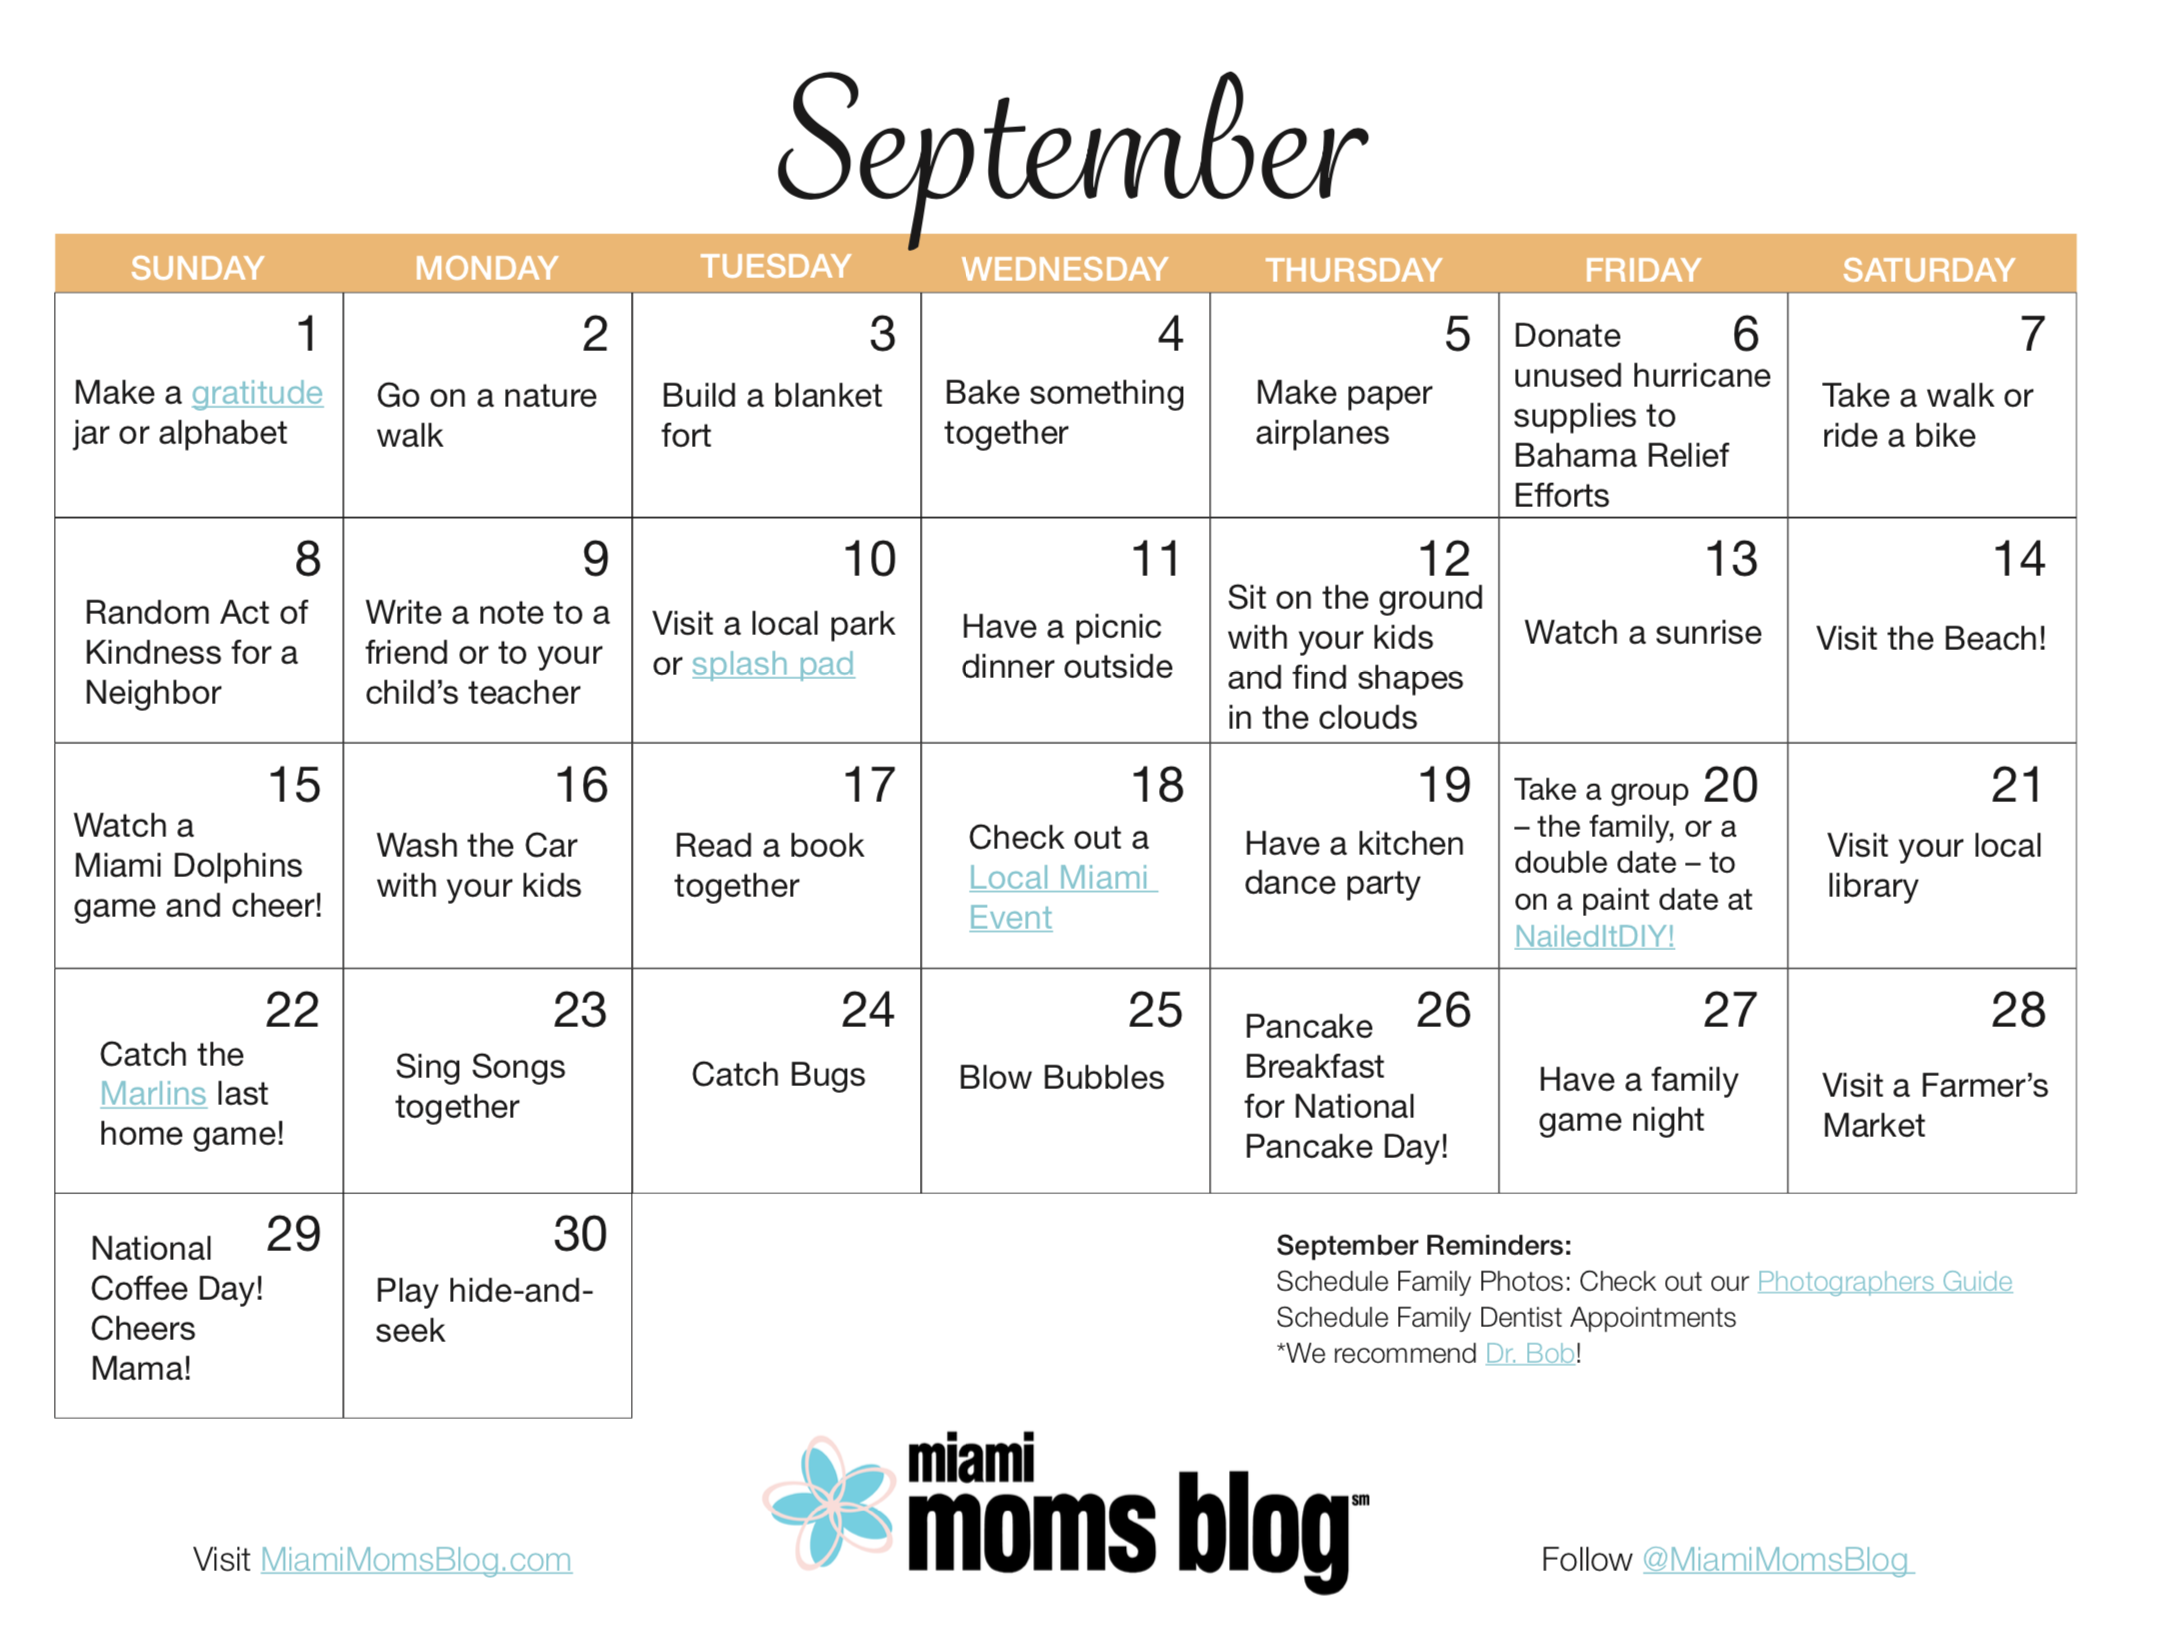 september activity calendar miami moms blog